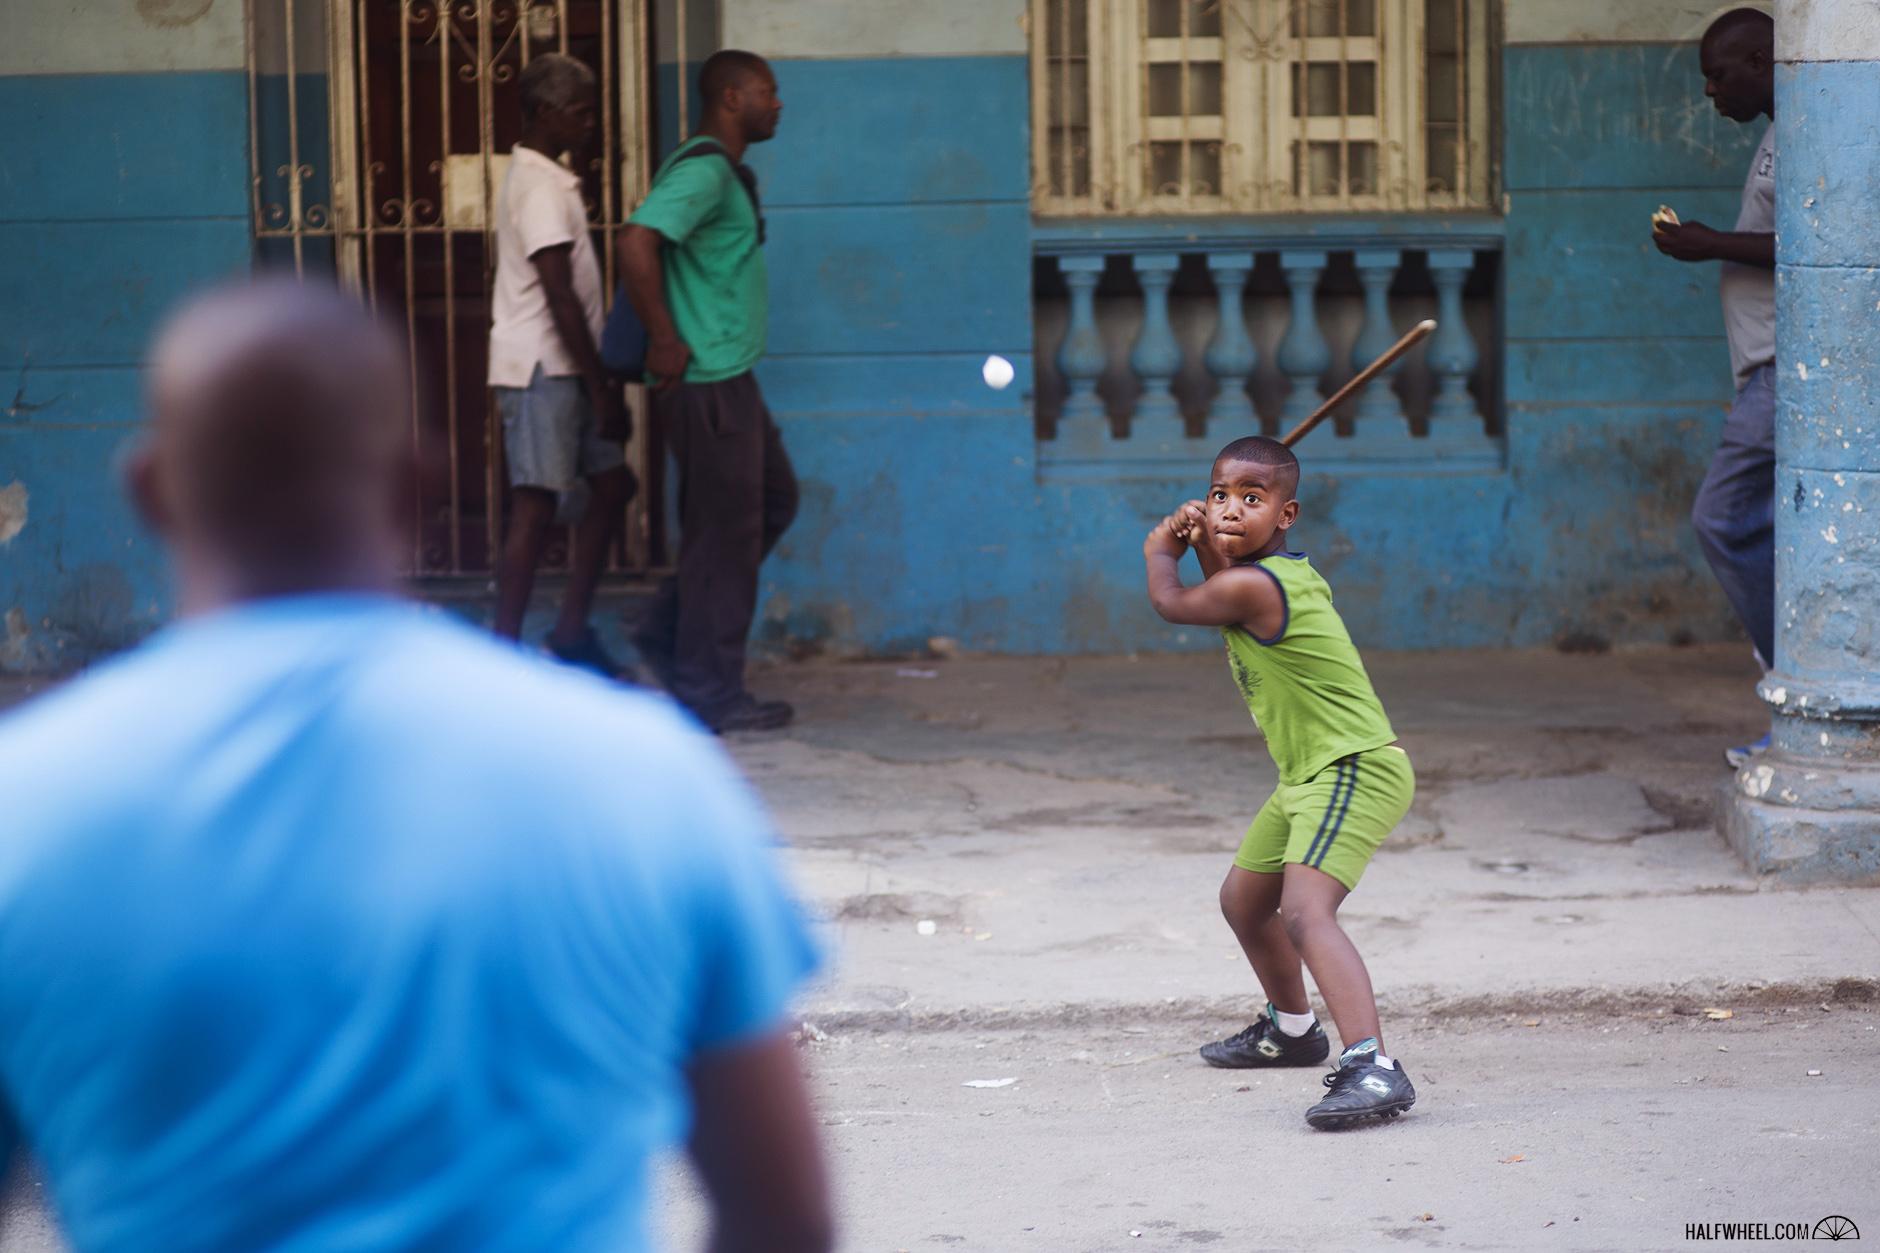 Streets of Havana Baseball